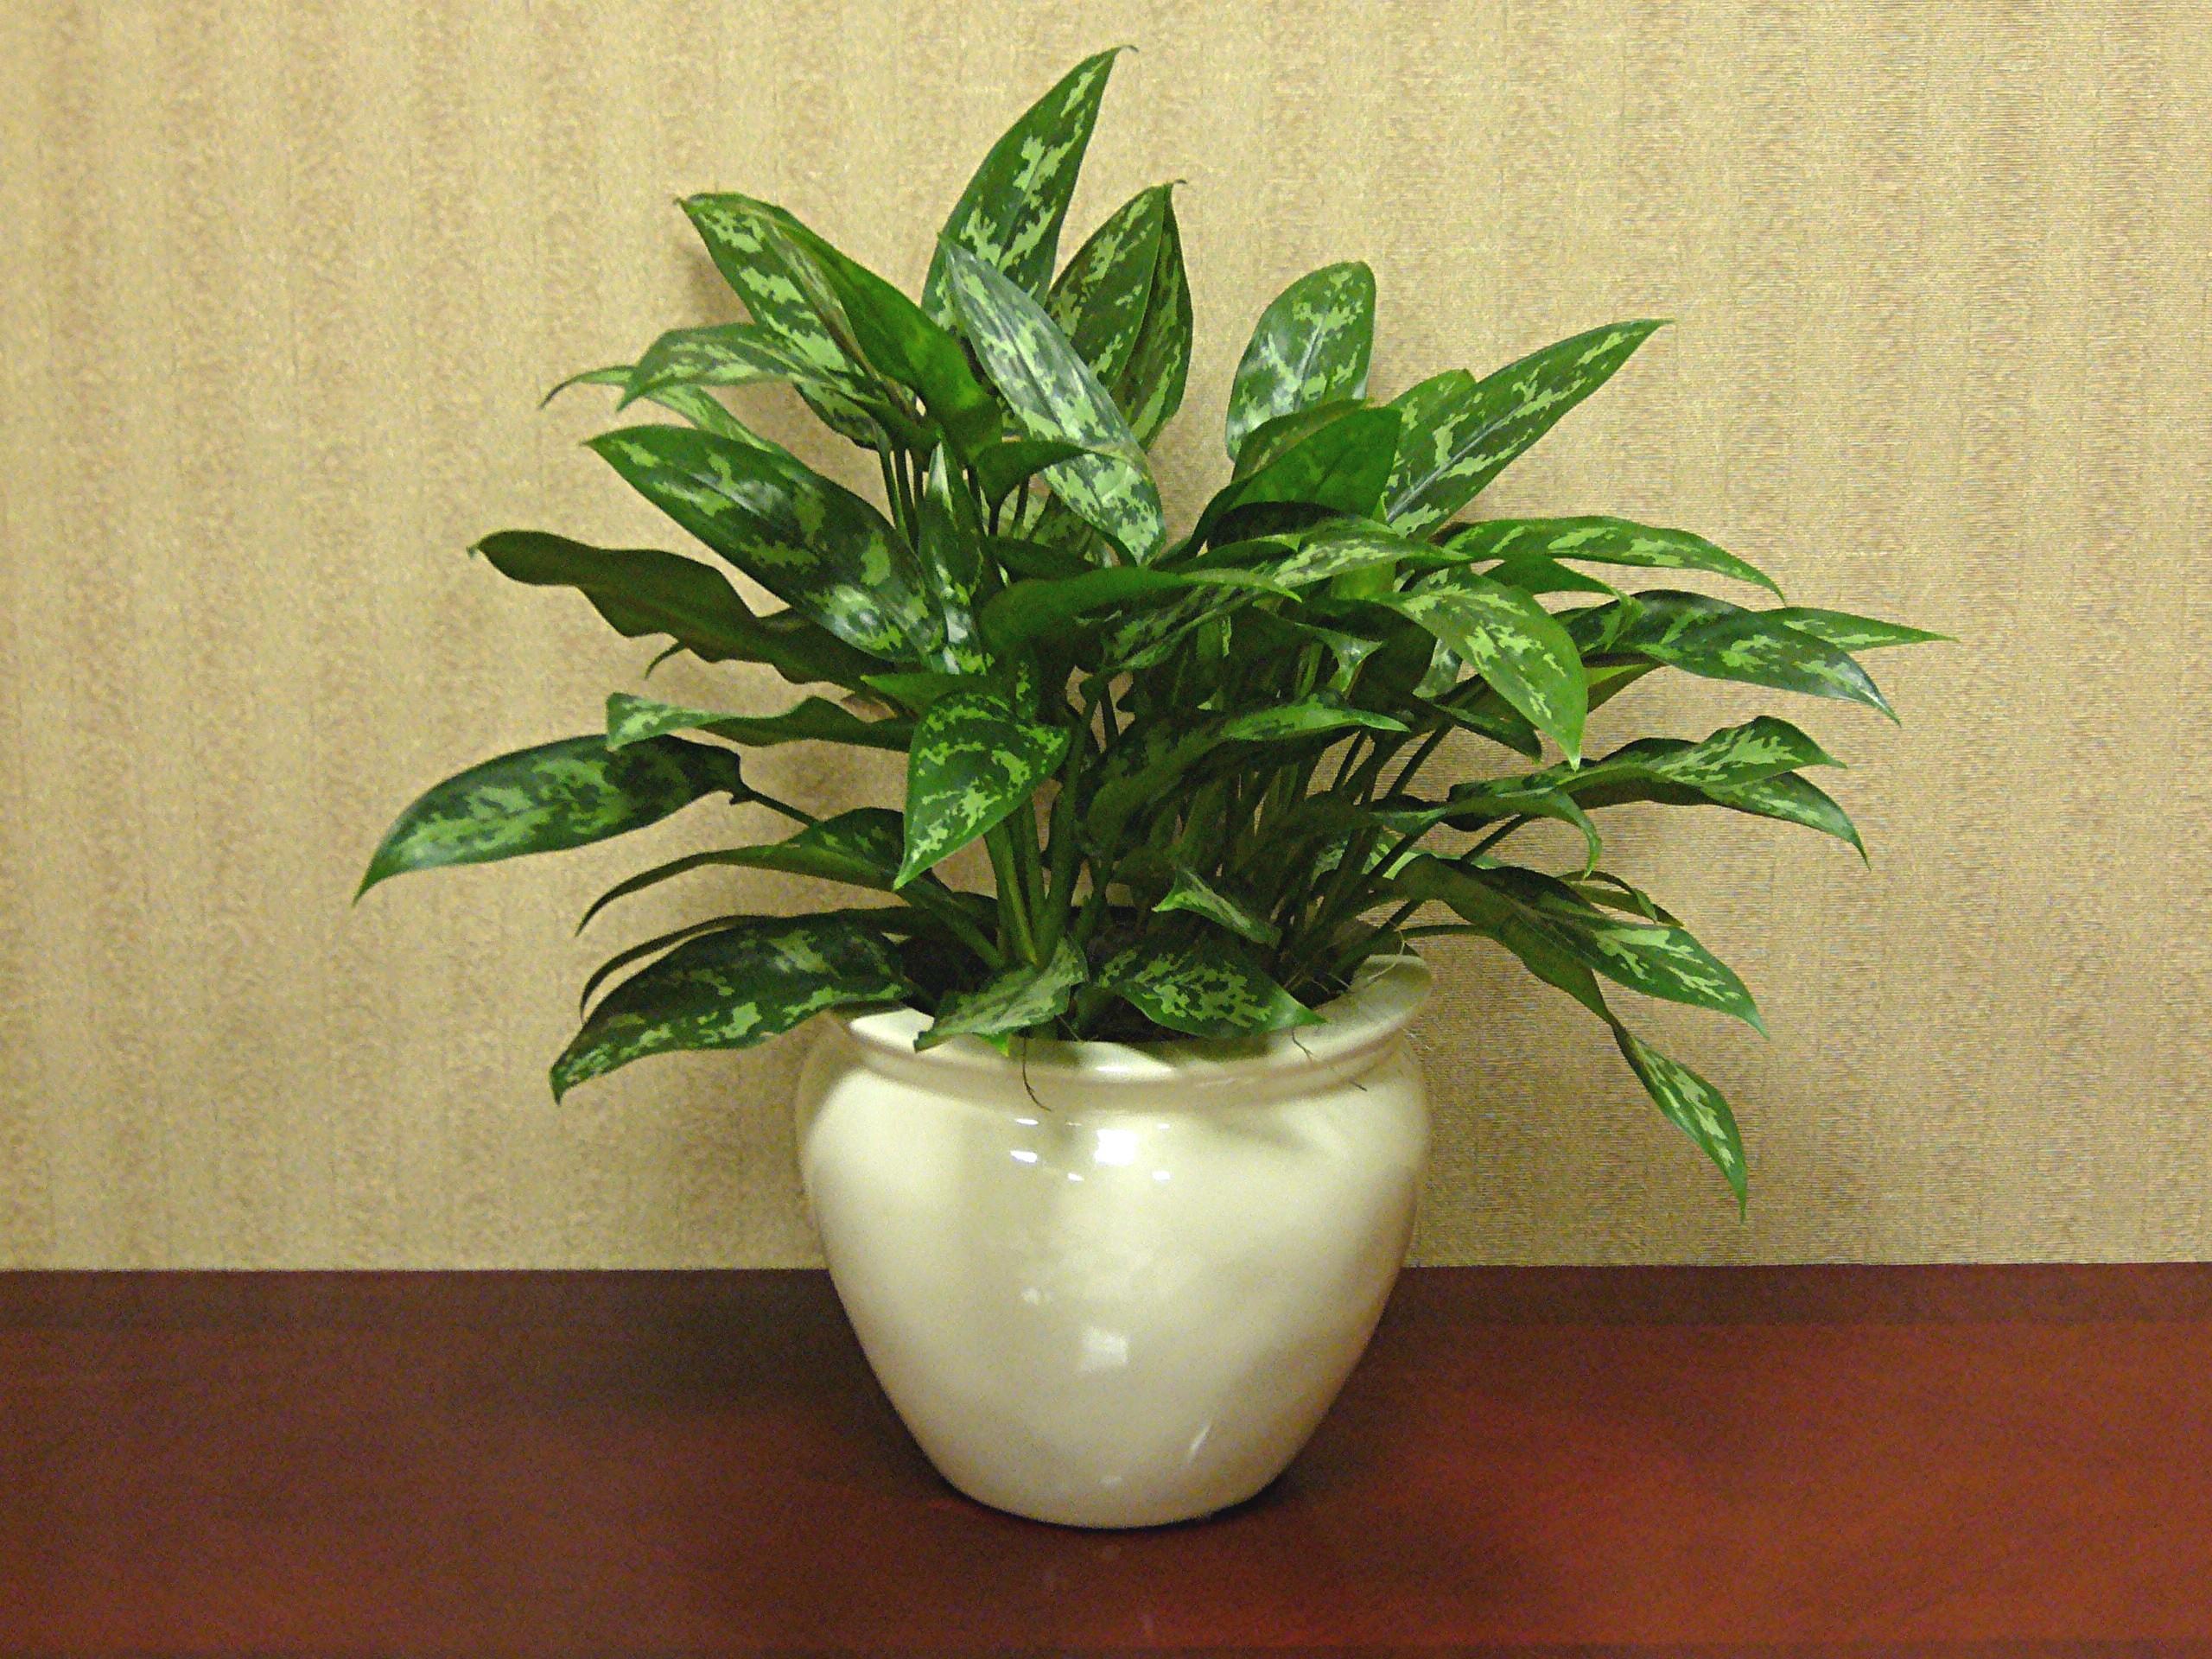 Interiorplantsnj Residentialinteriorplantsnj Houseplantsnj